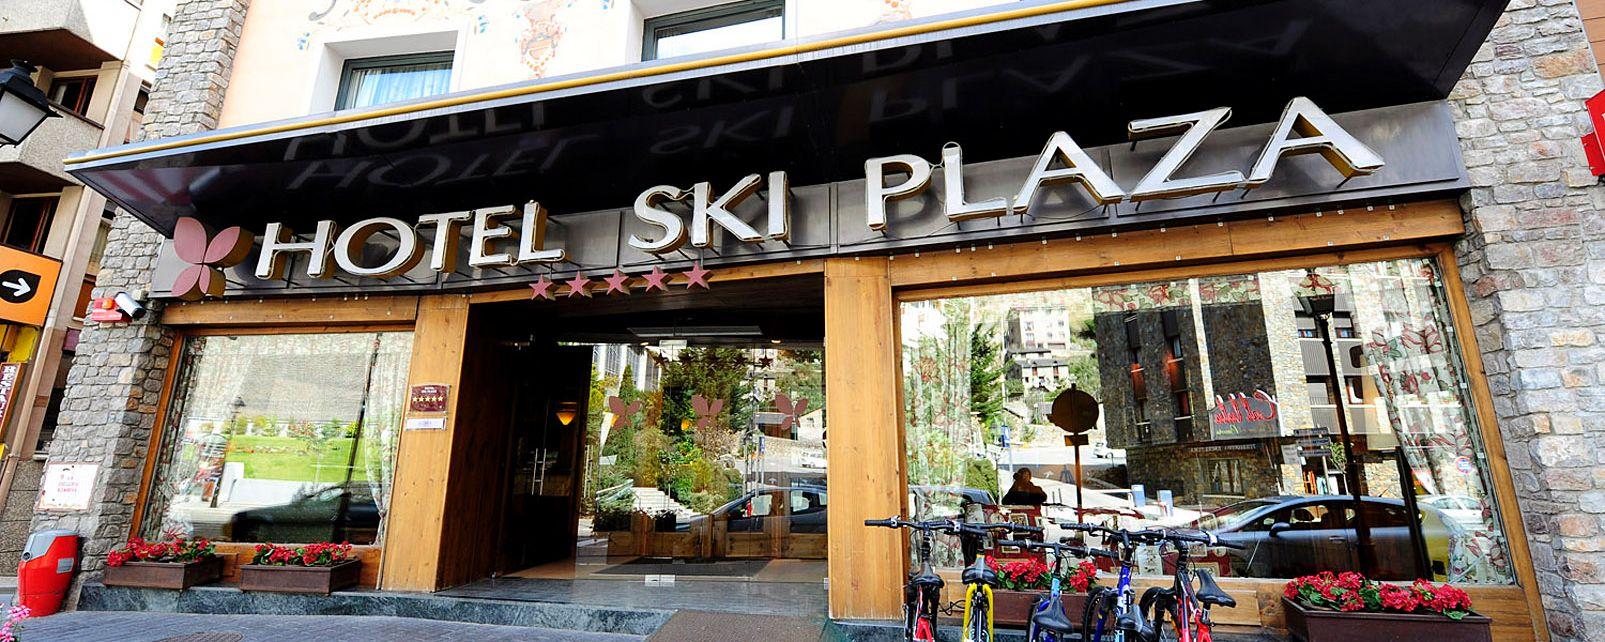 Hotel Ski Plaza